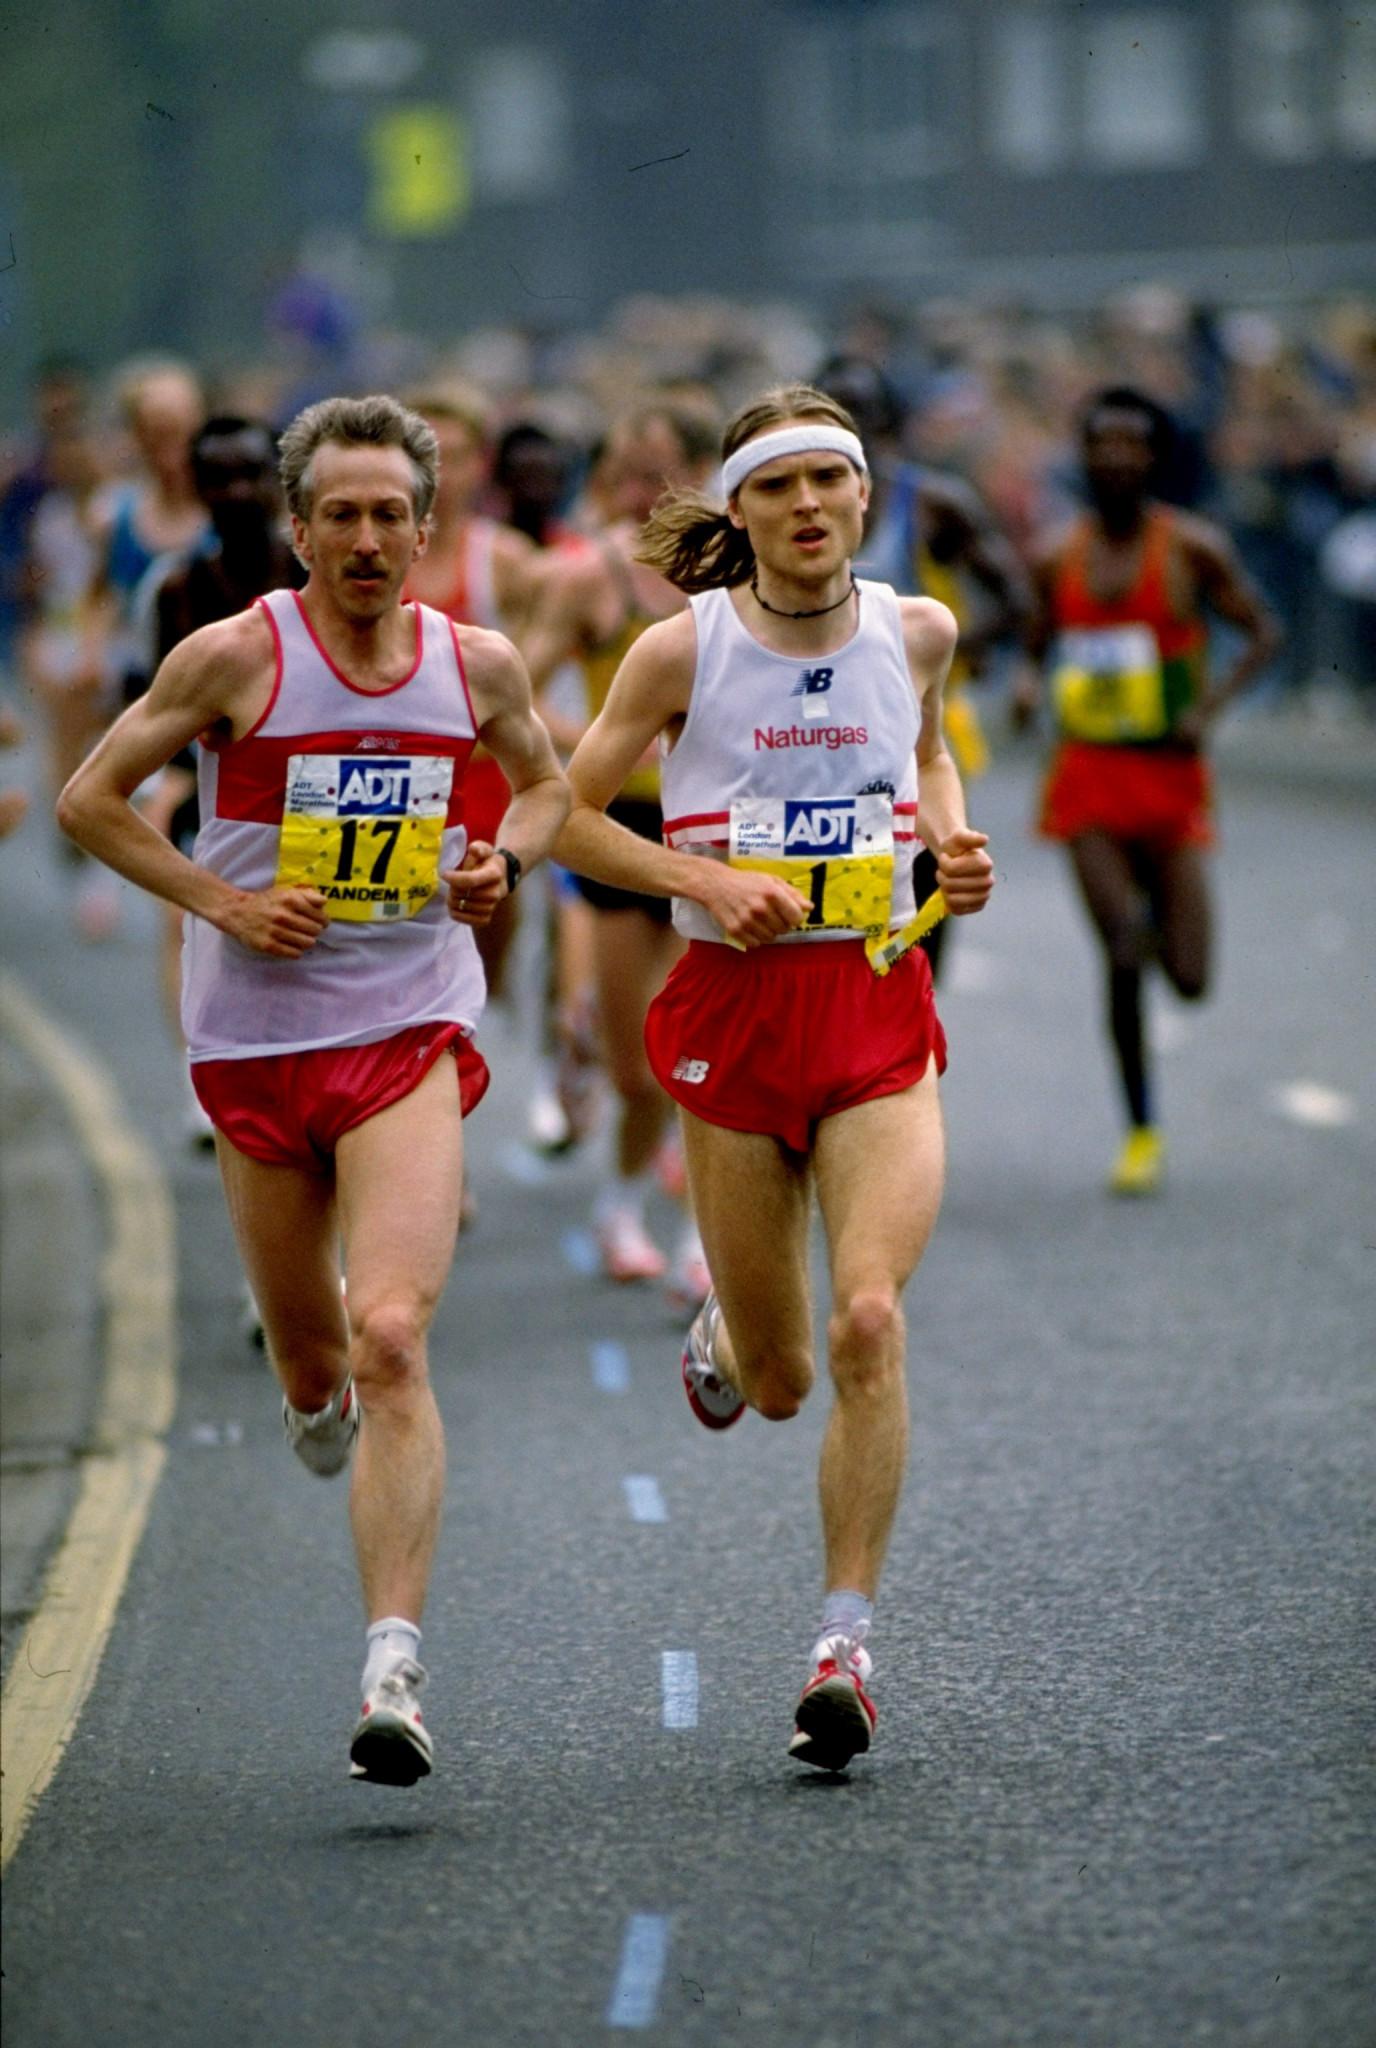 Denmark's Henrik Jørgensen, right, in 1989 defending his London Marathon title ©Getty Images